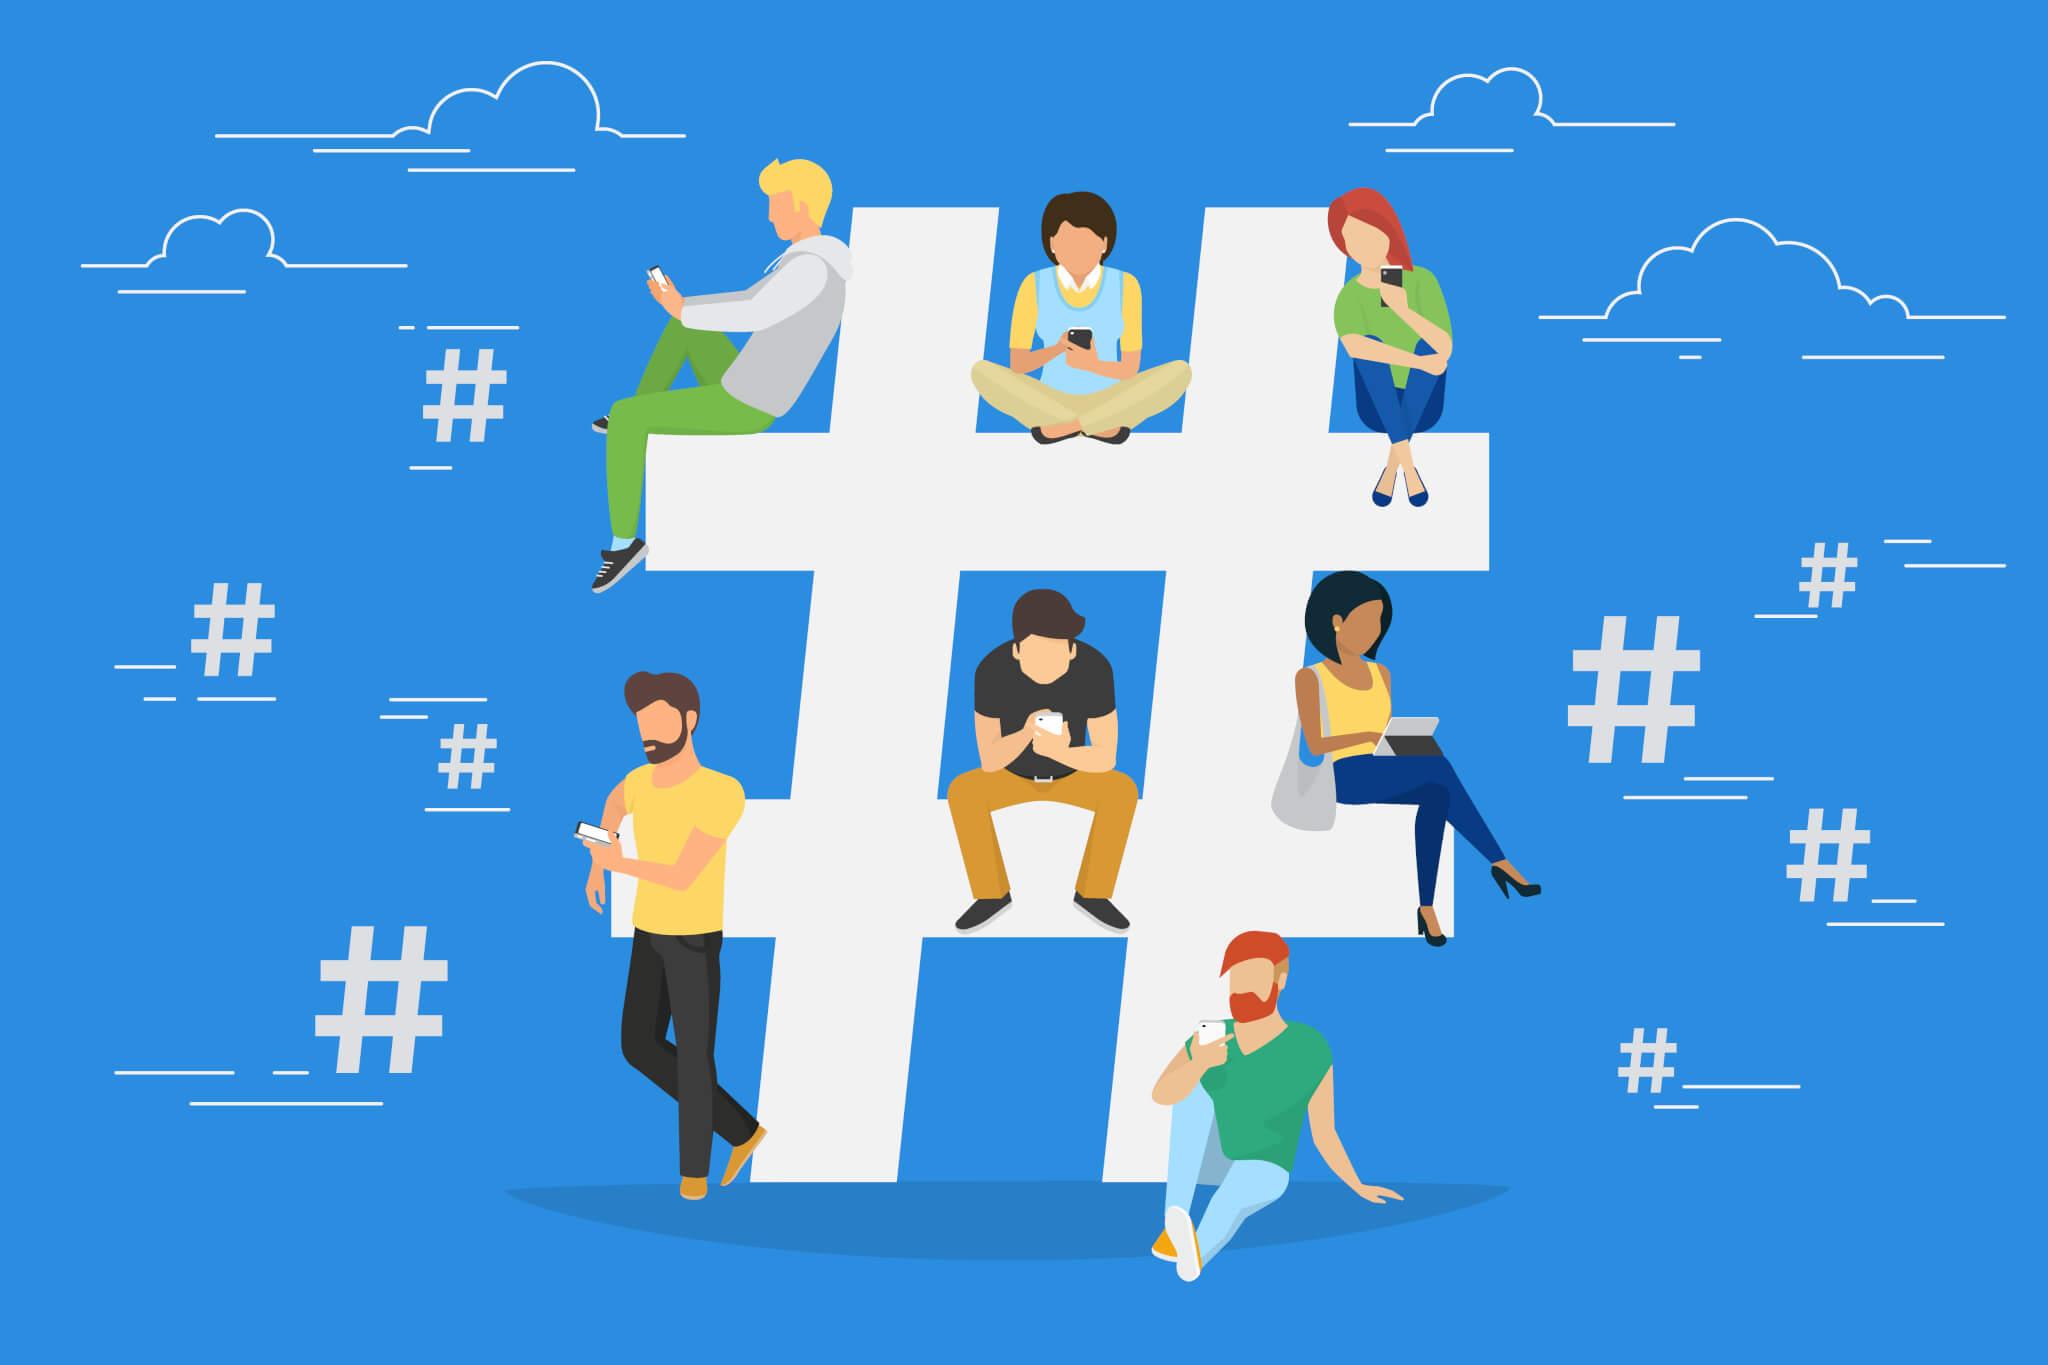 Vector illustration of engaged social media users